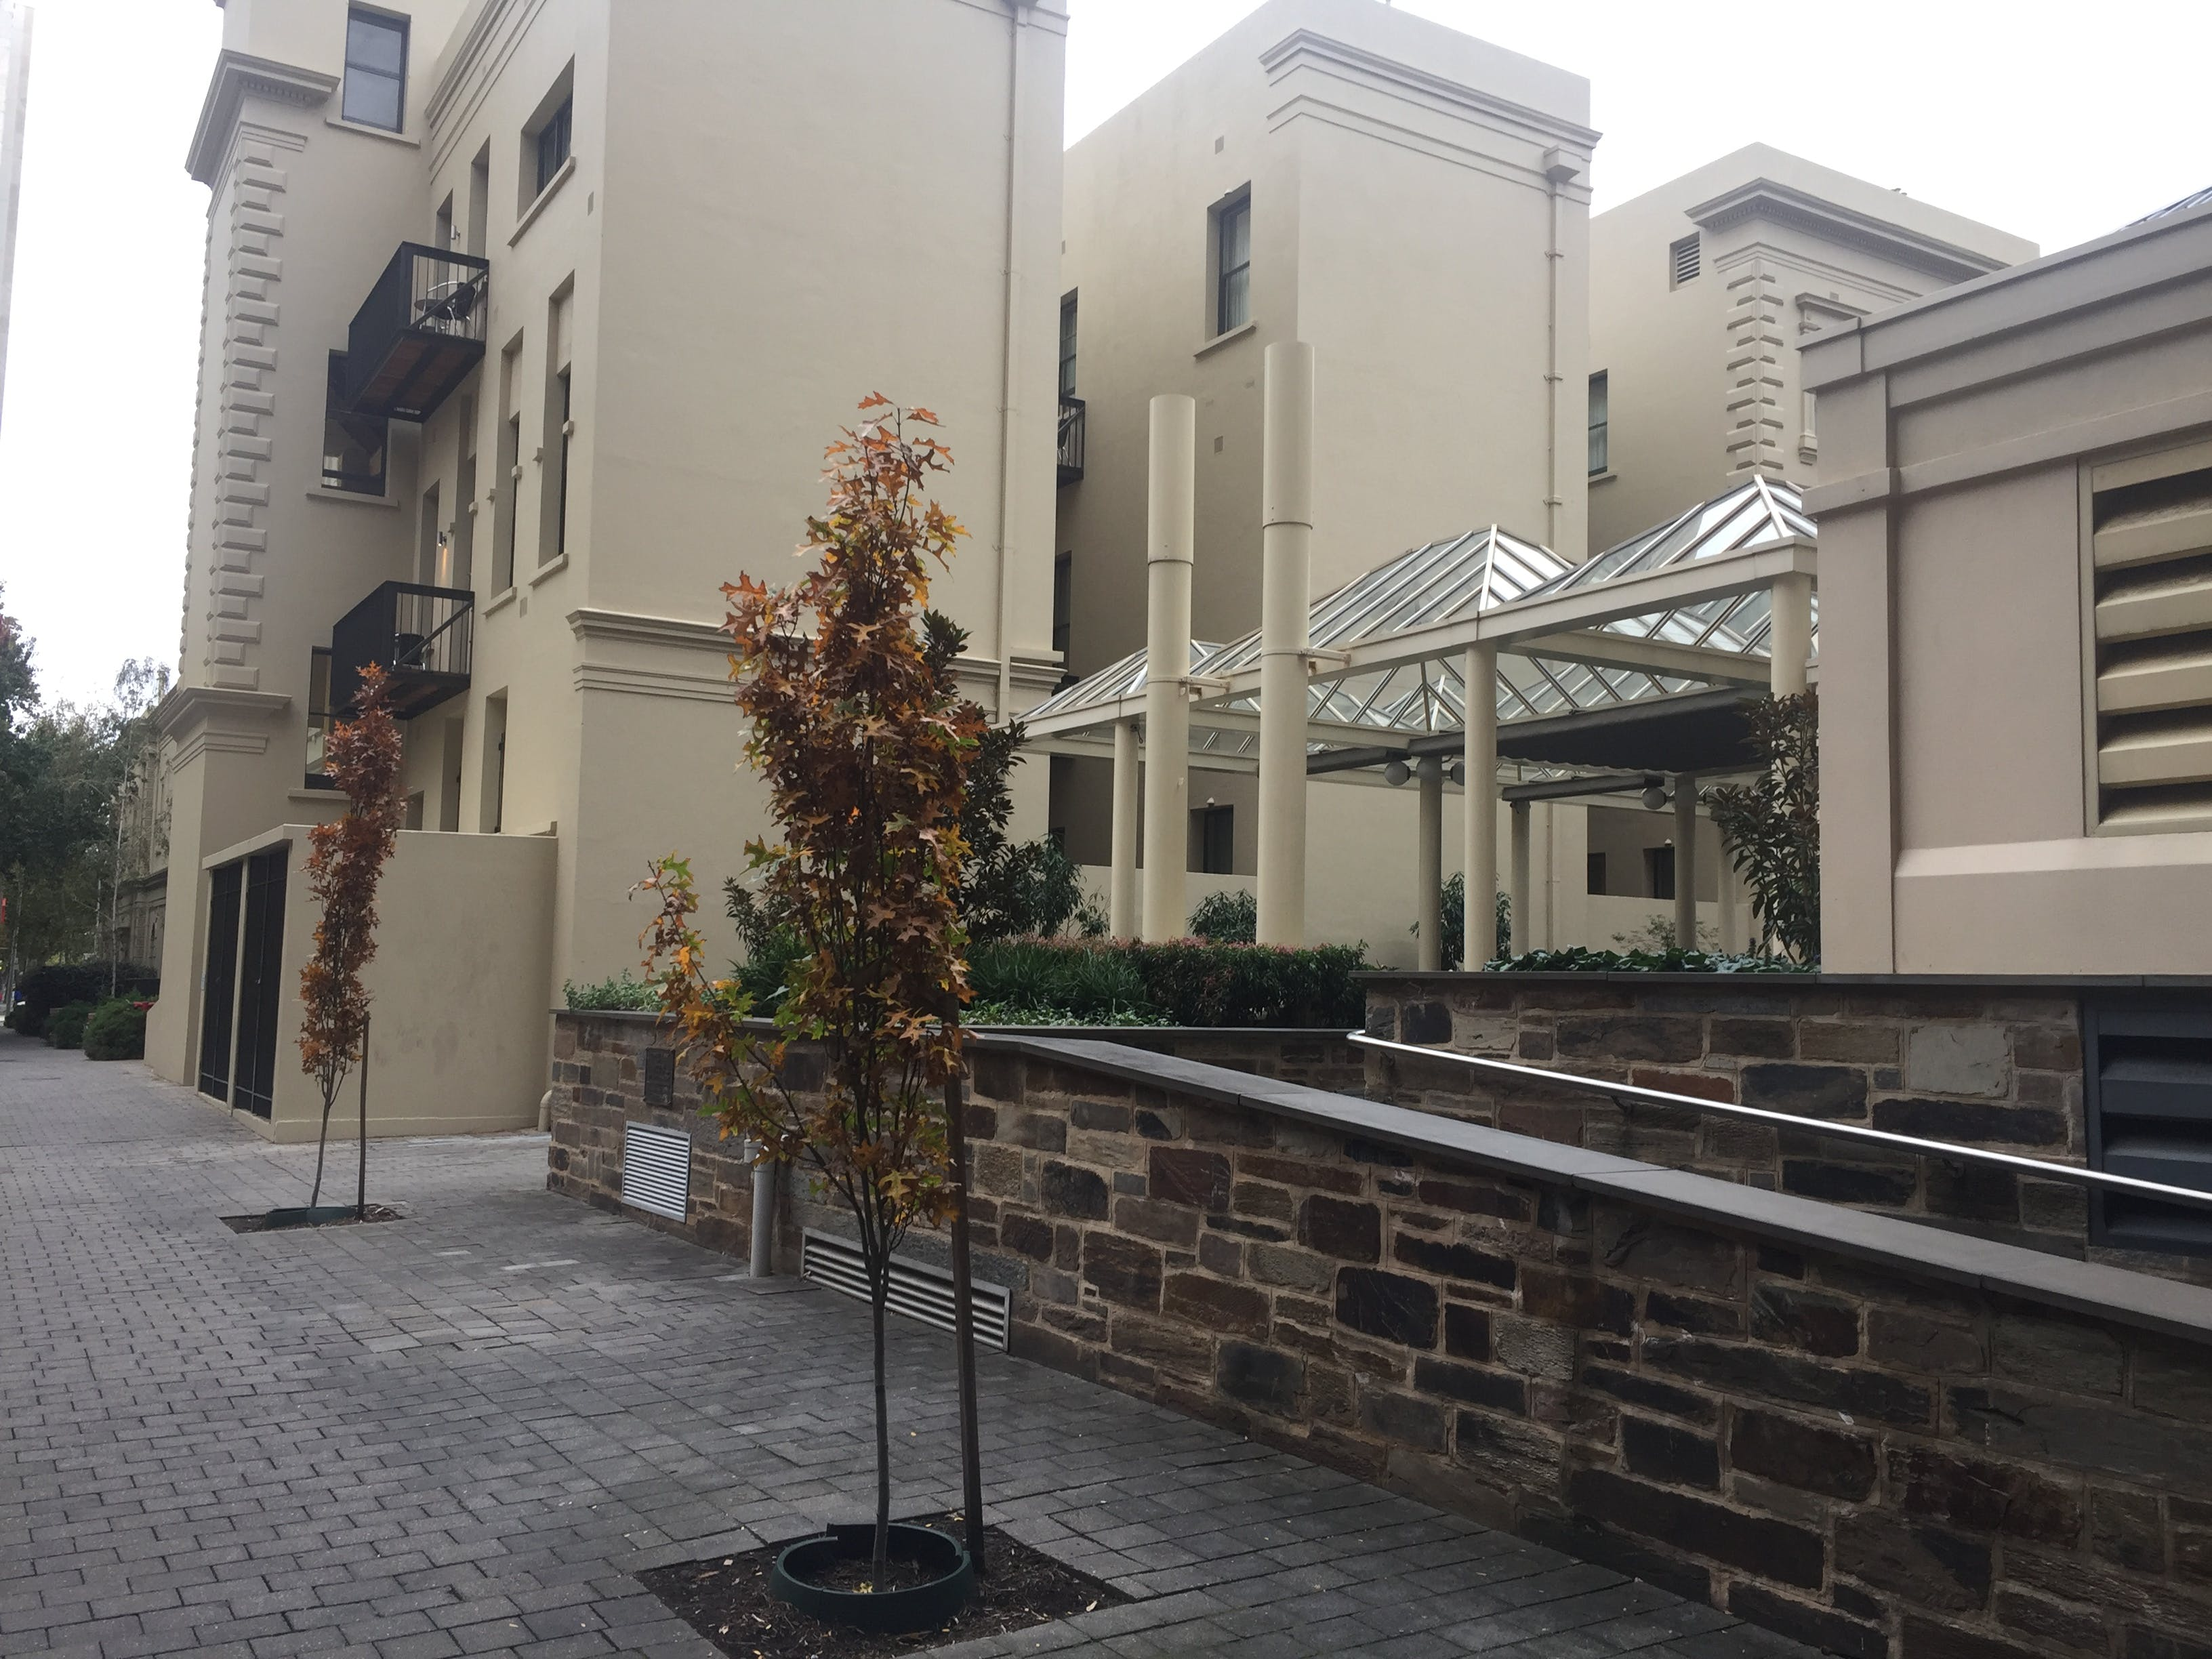 Town Hall Courtyard.Naomi.4